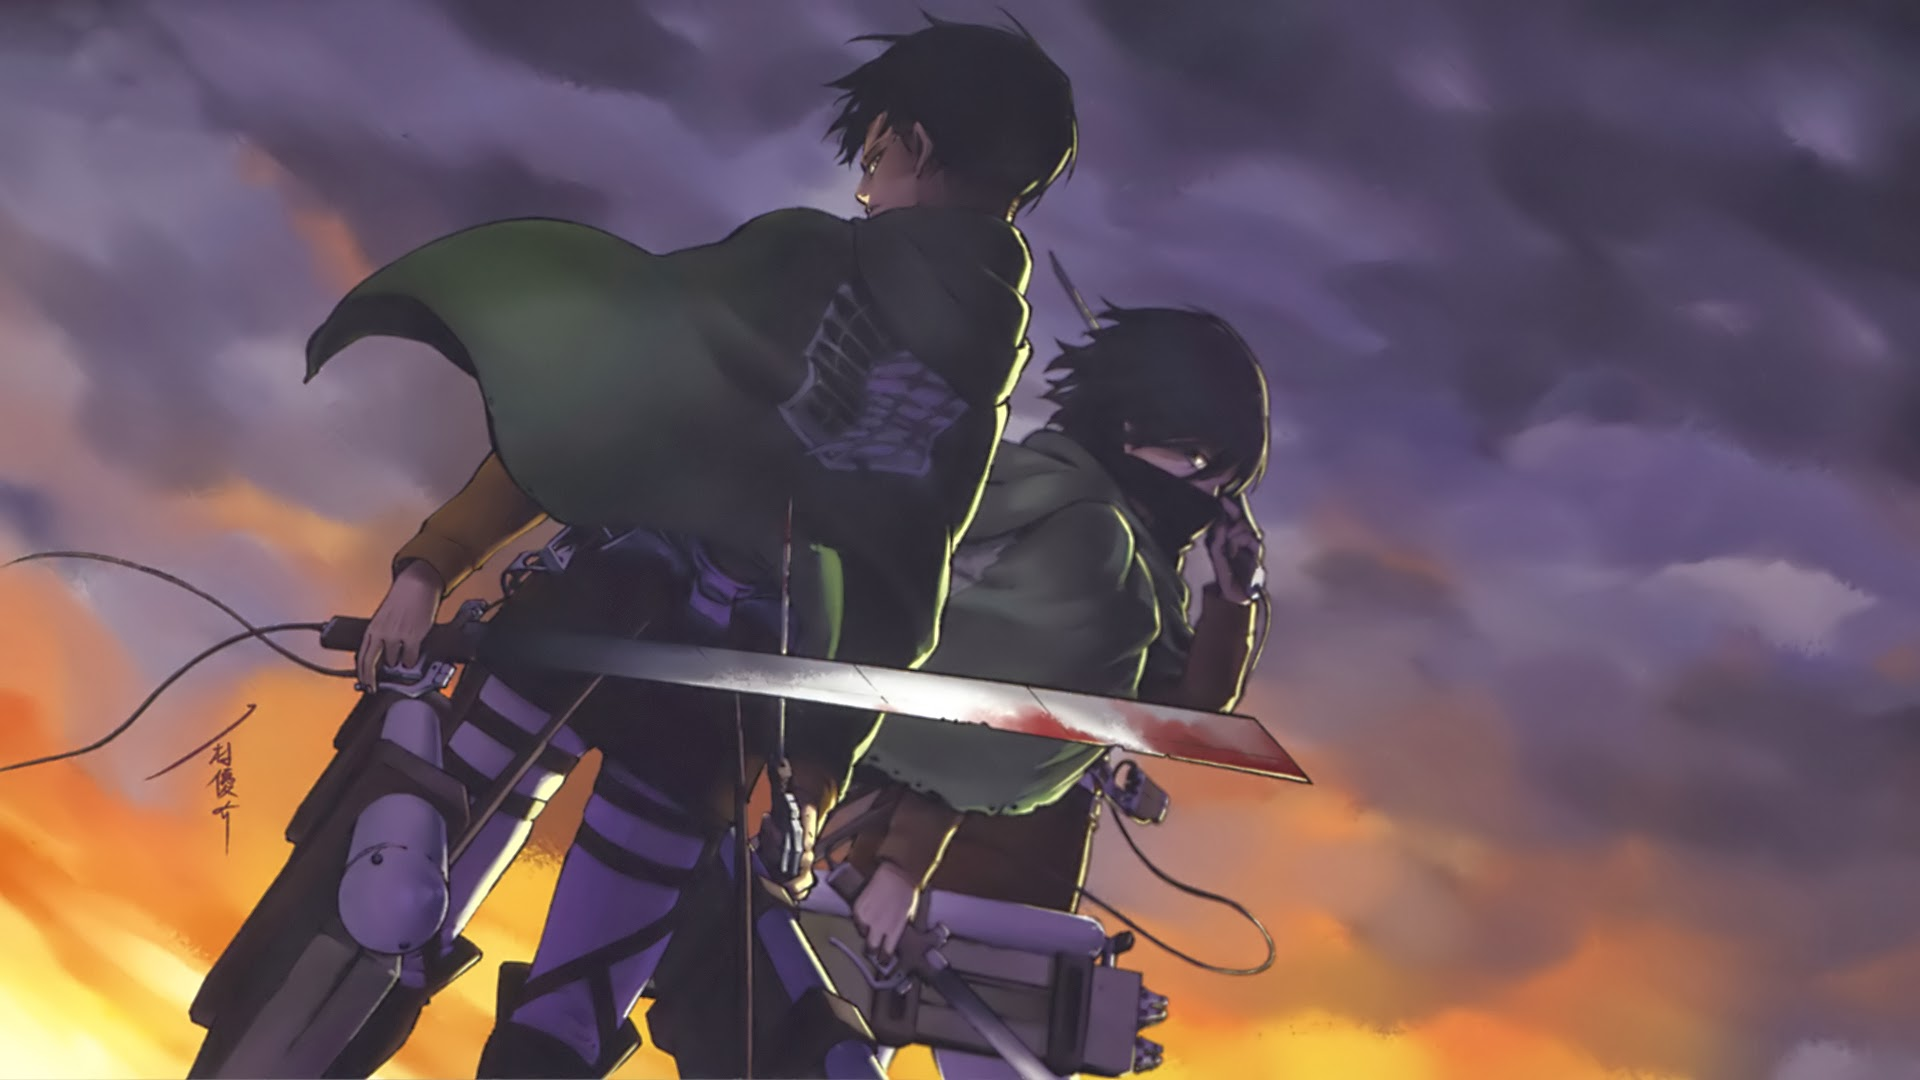 levi mikasa ackerman attack on titan shingeki no kyojin anime hd 1920x1080